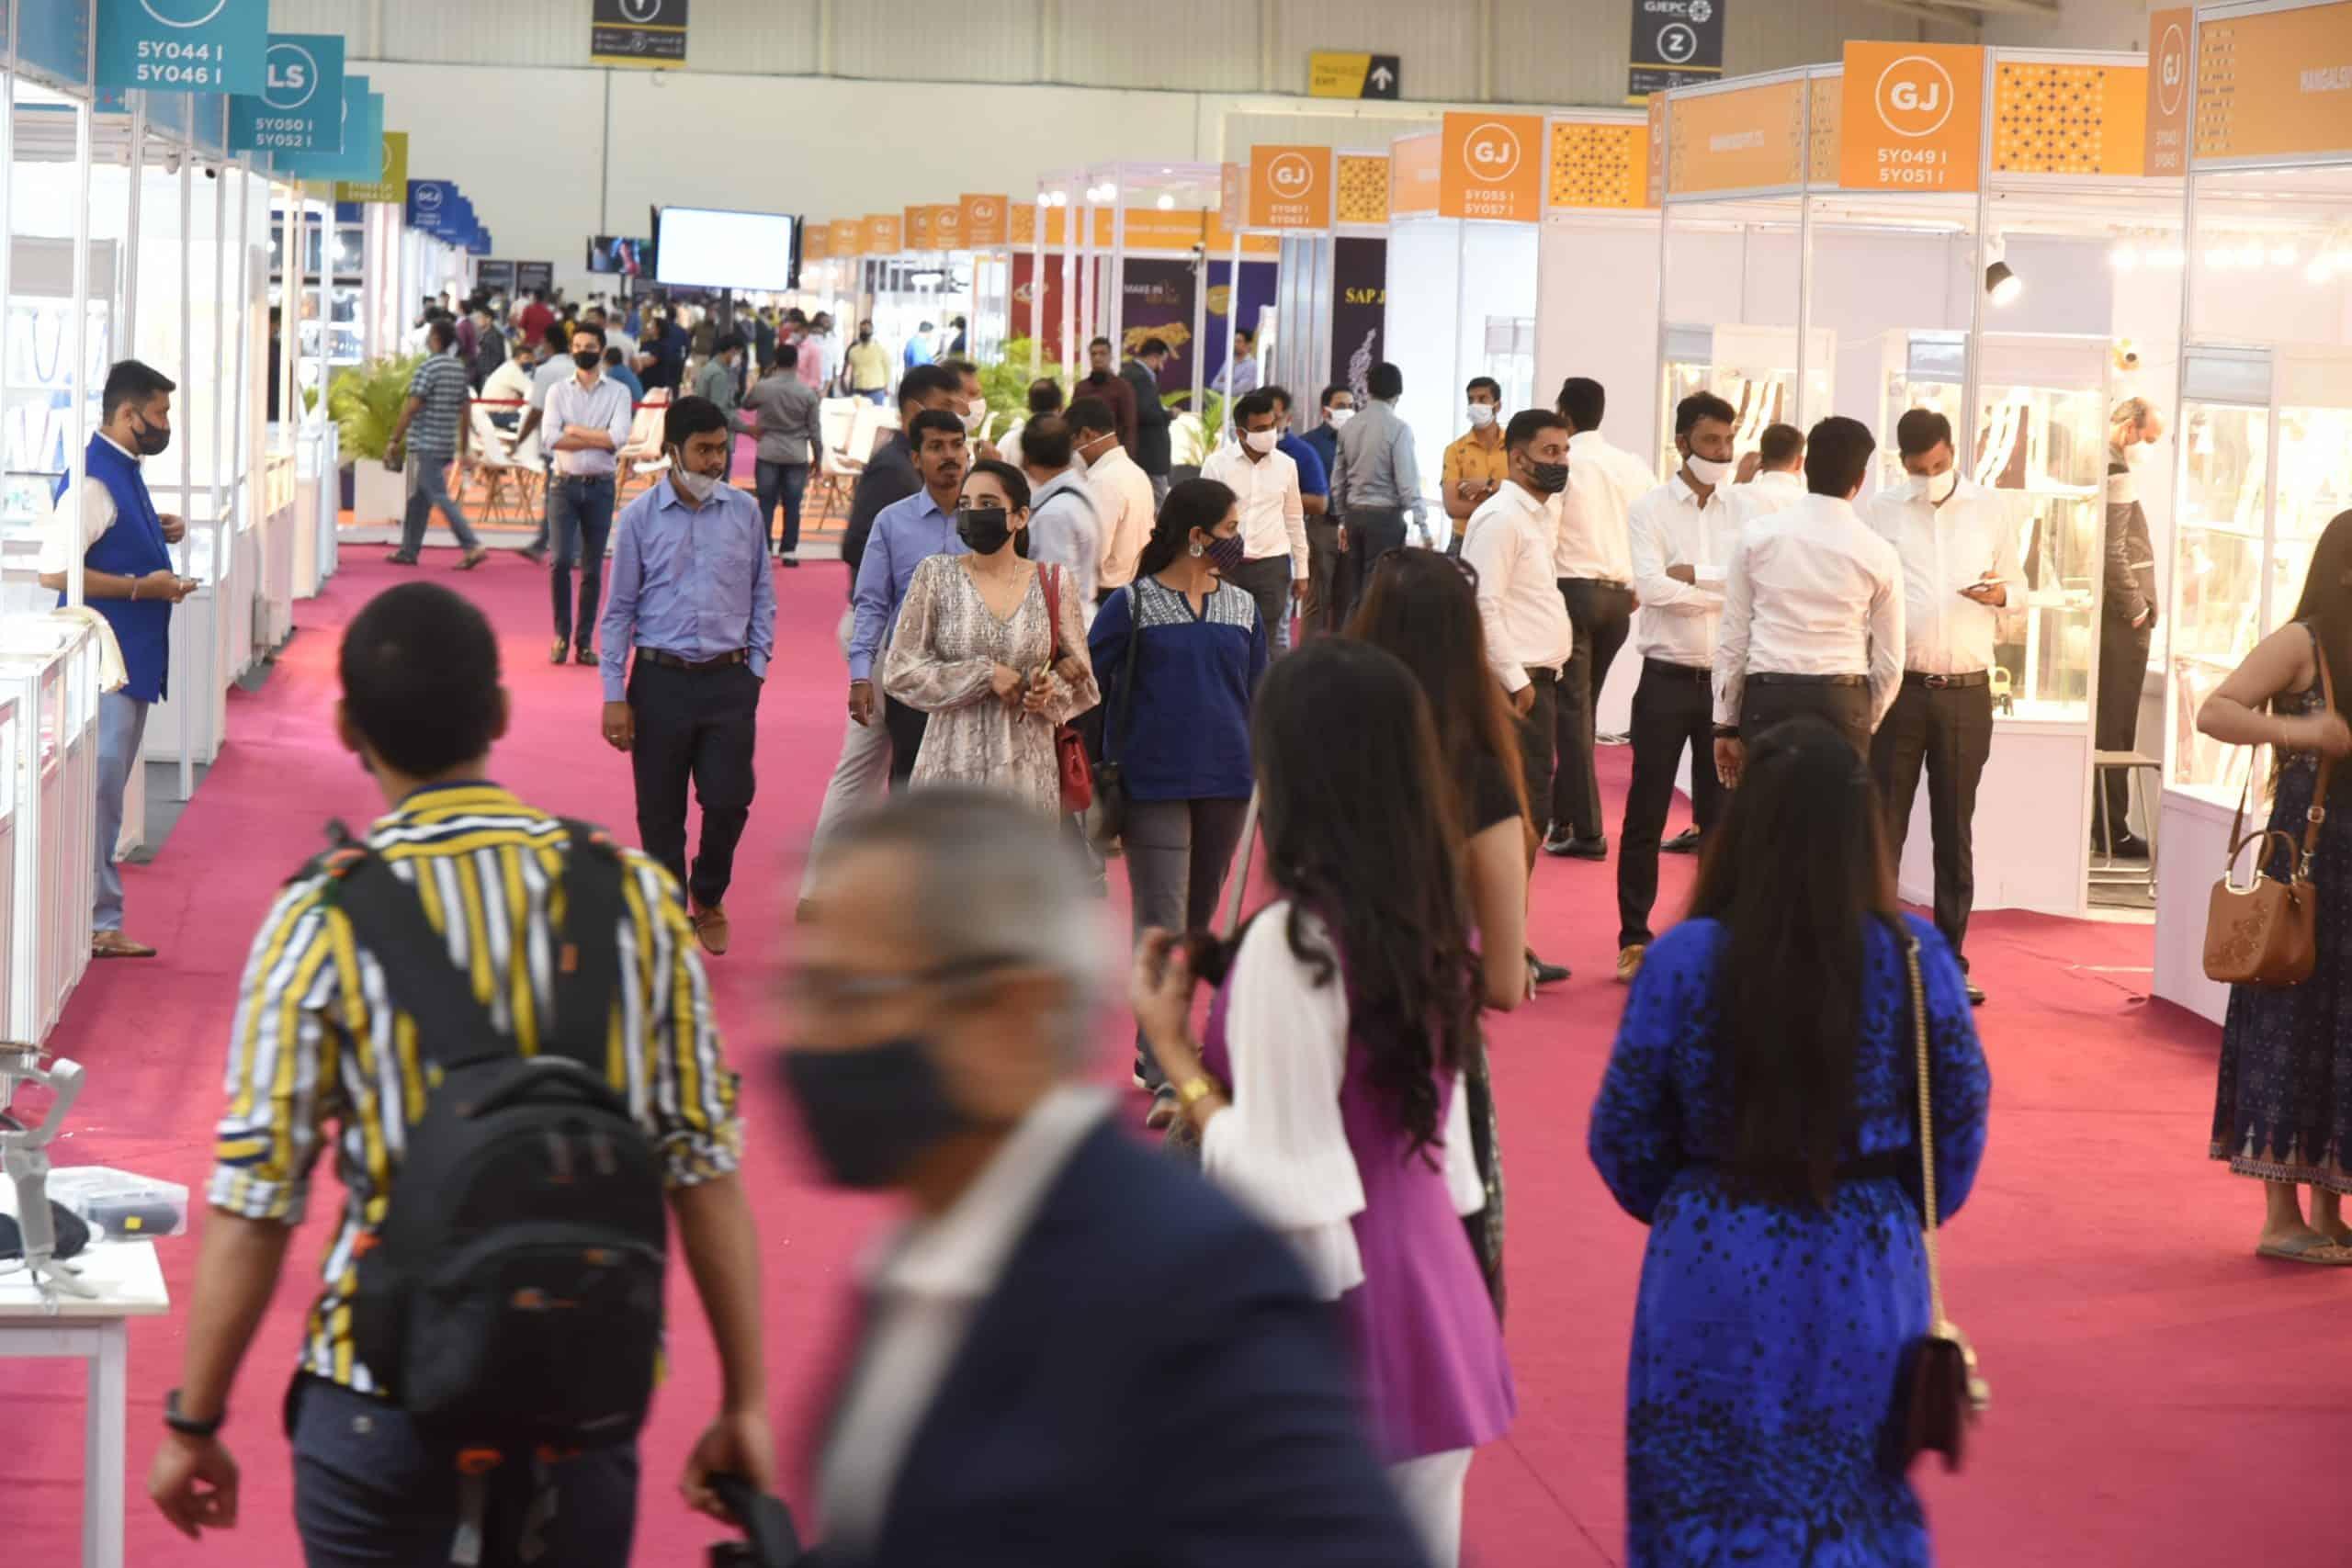 IIJS Premiere 2021 boosts local economy in Bangaluru